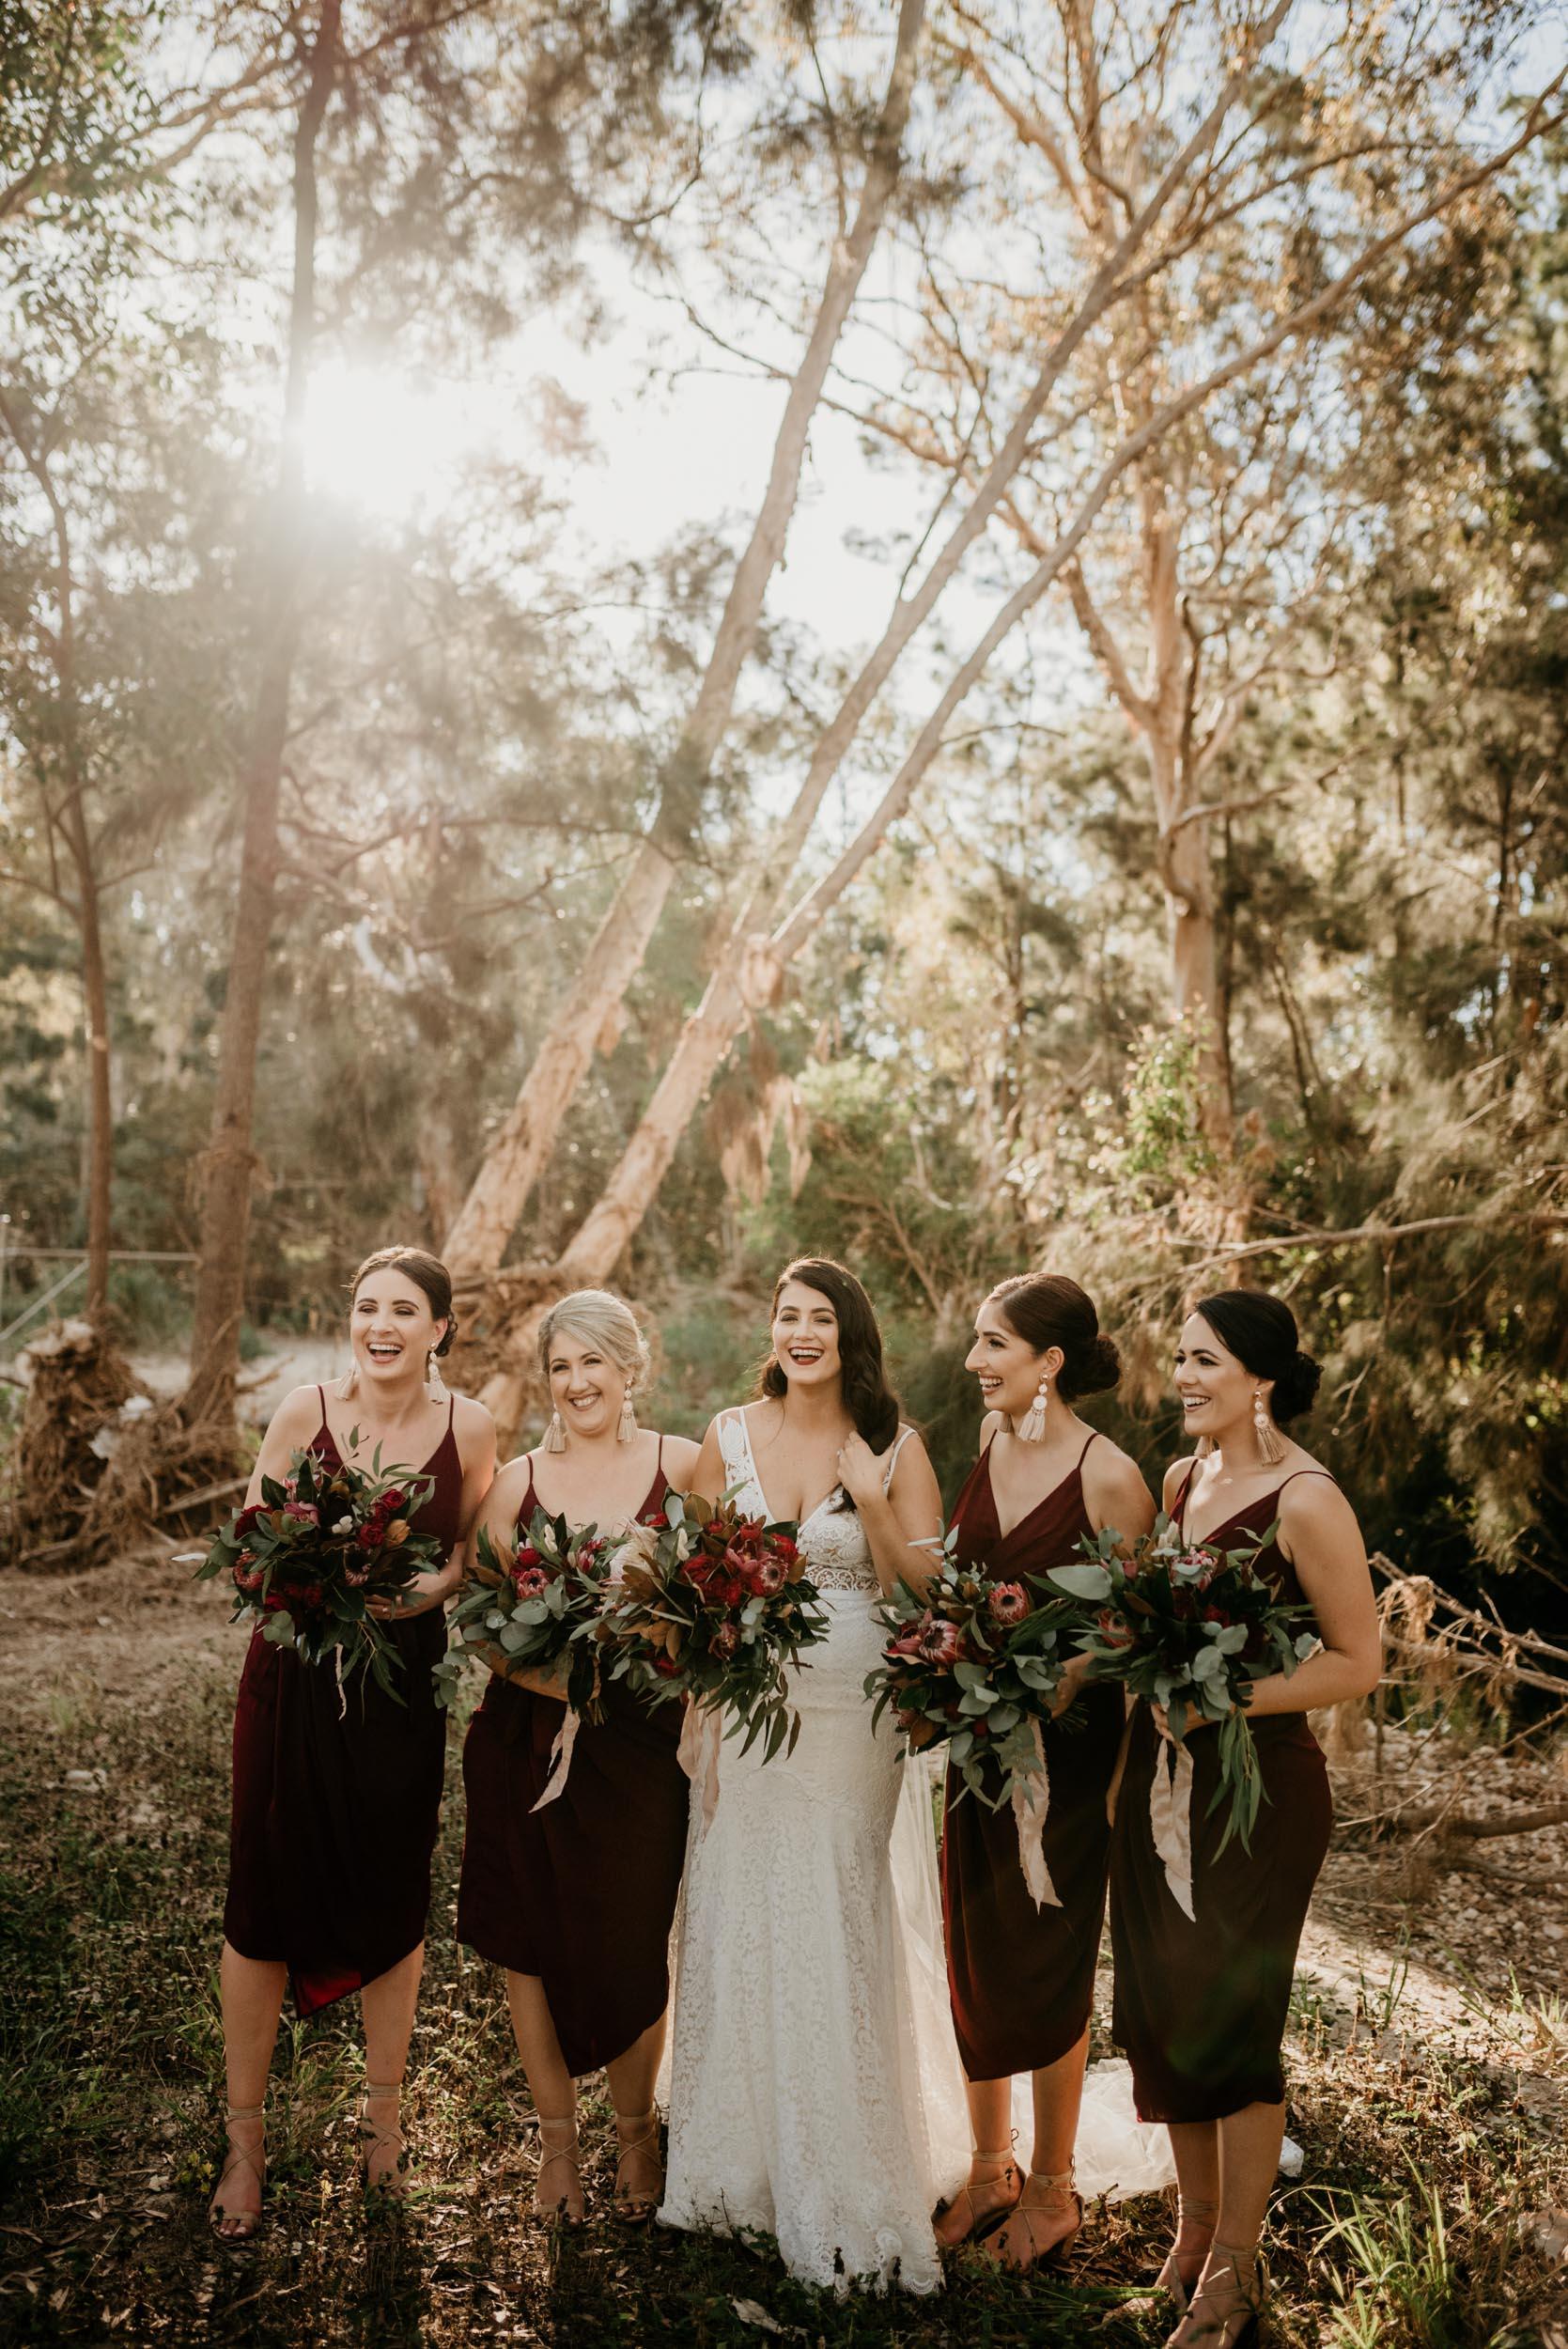 The Raw Photographer - Cairns and Port Douglas Wedding Photographer - Best of 2018-55.jpg